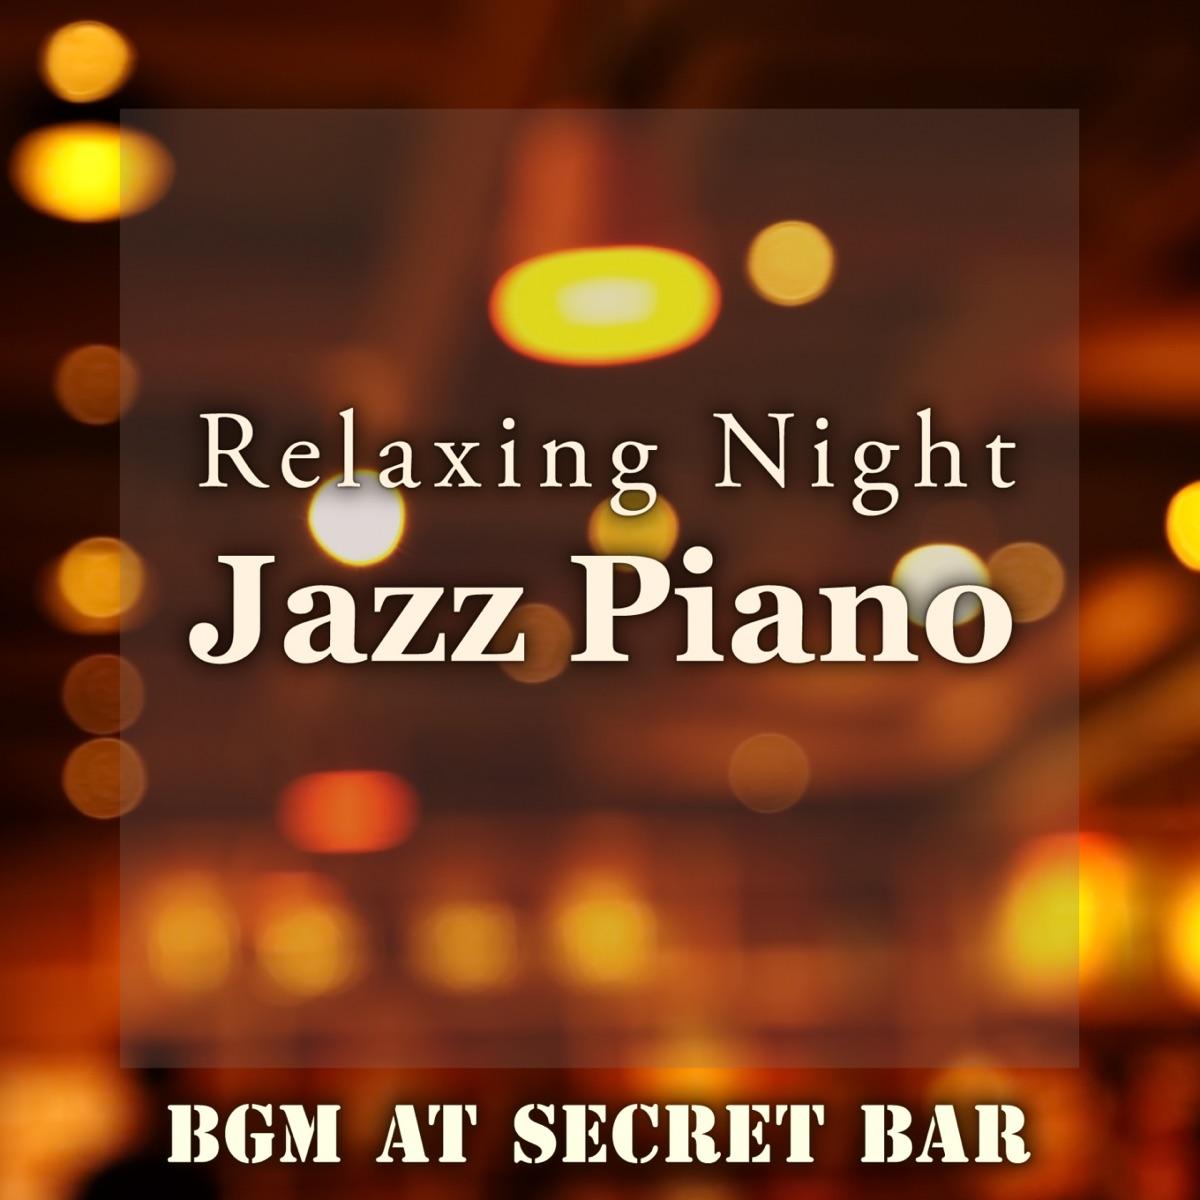 Relaxing Night Jazz Piano BGM at Secret Bar Relaxing Piano Crew CD cover